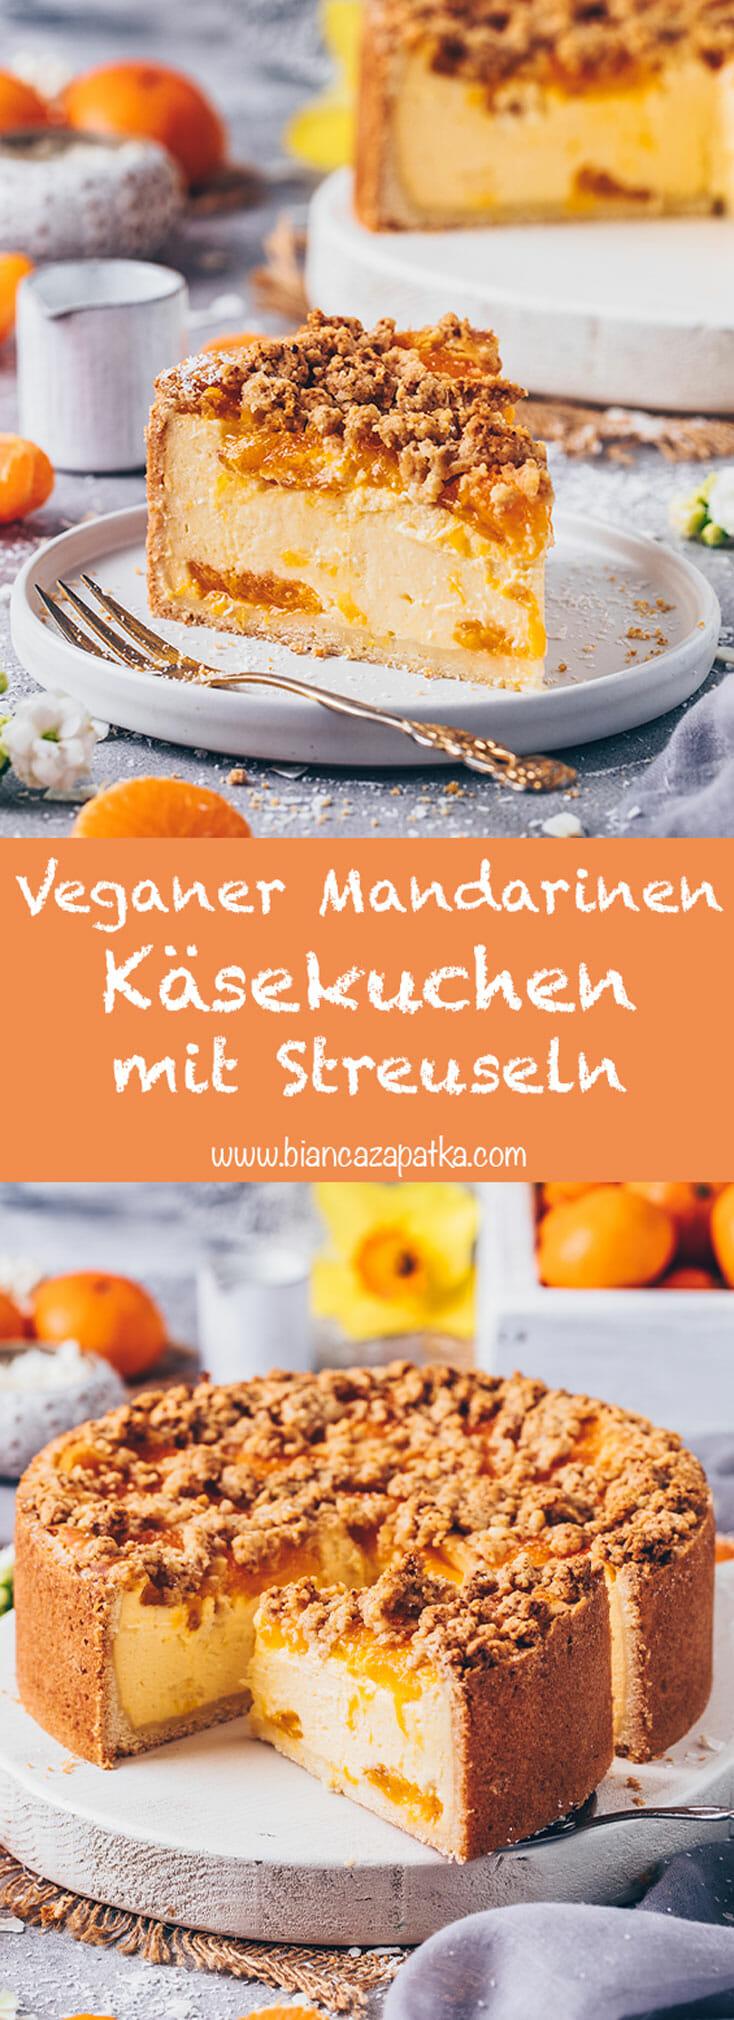 Veganer Mandarinen-Käsekuchen mit Streuseln